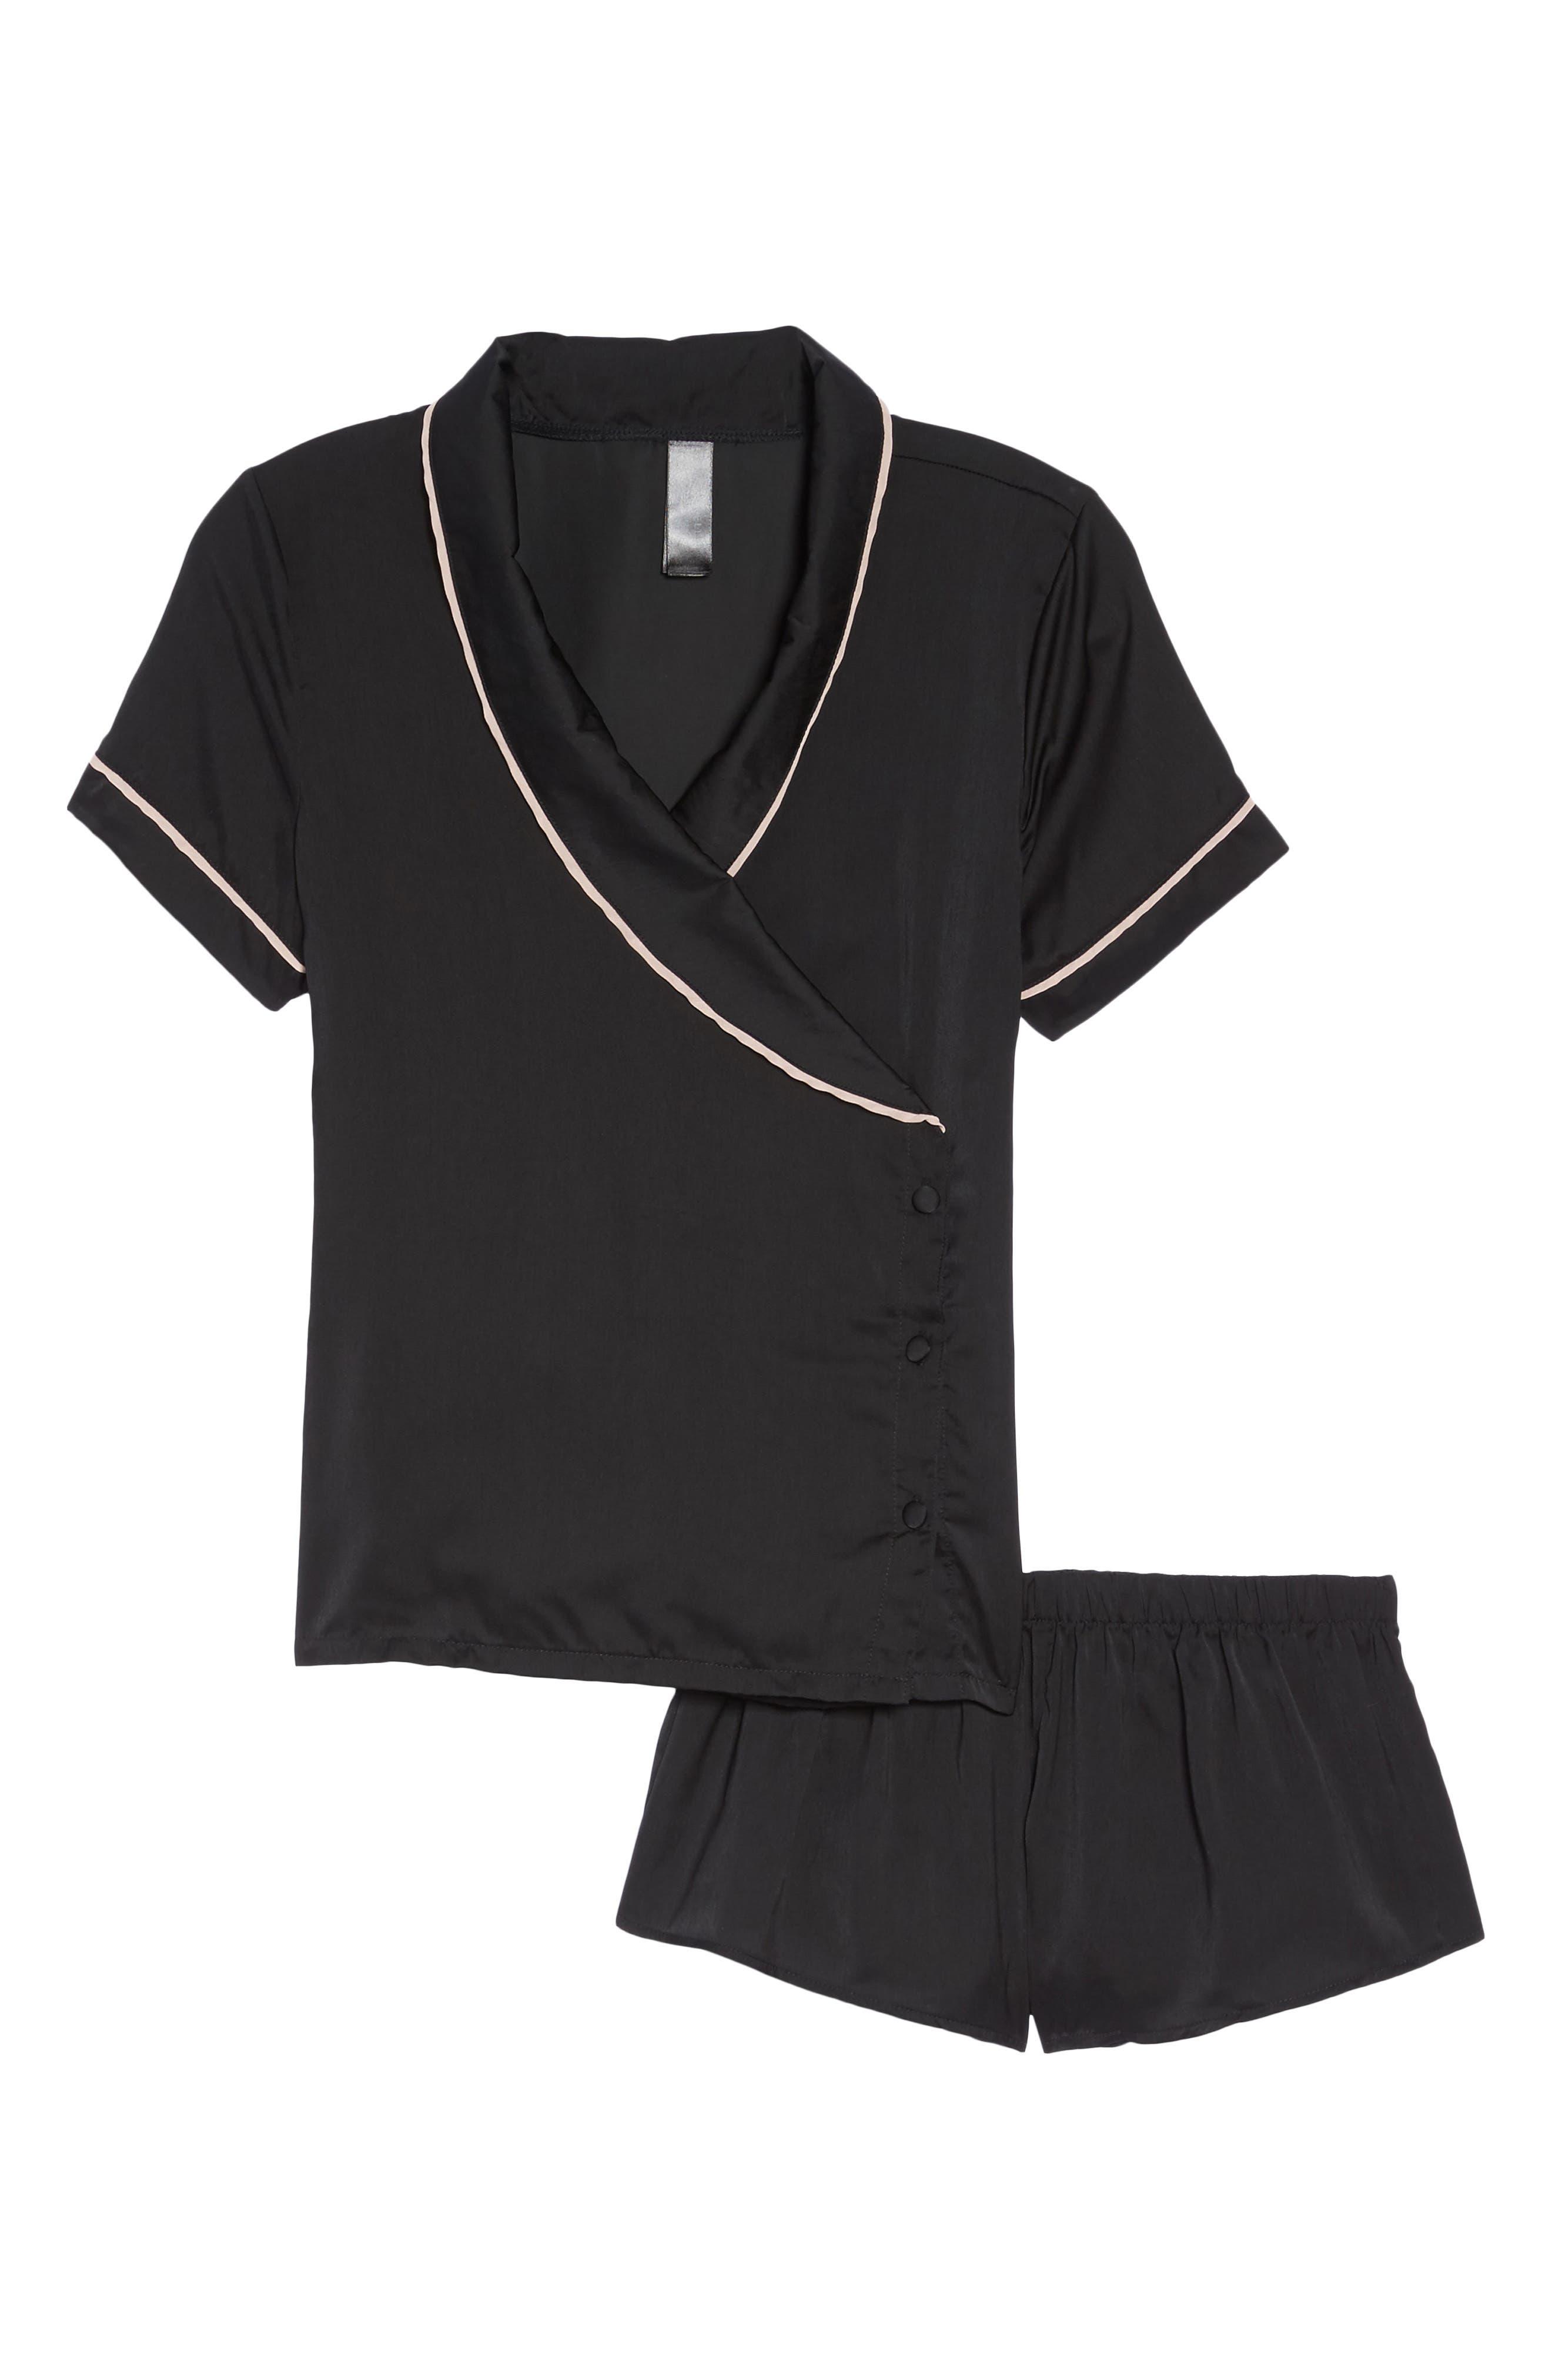 Kara Wrap Top & Shorts Set,                             Alternate thumbnail 4, color,                             Black/ Rose Dust